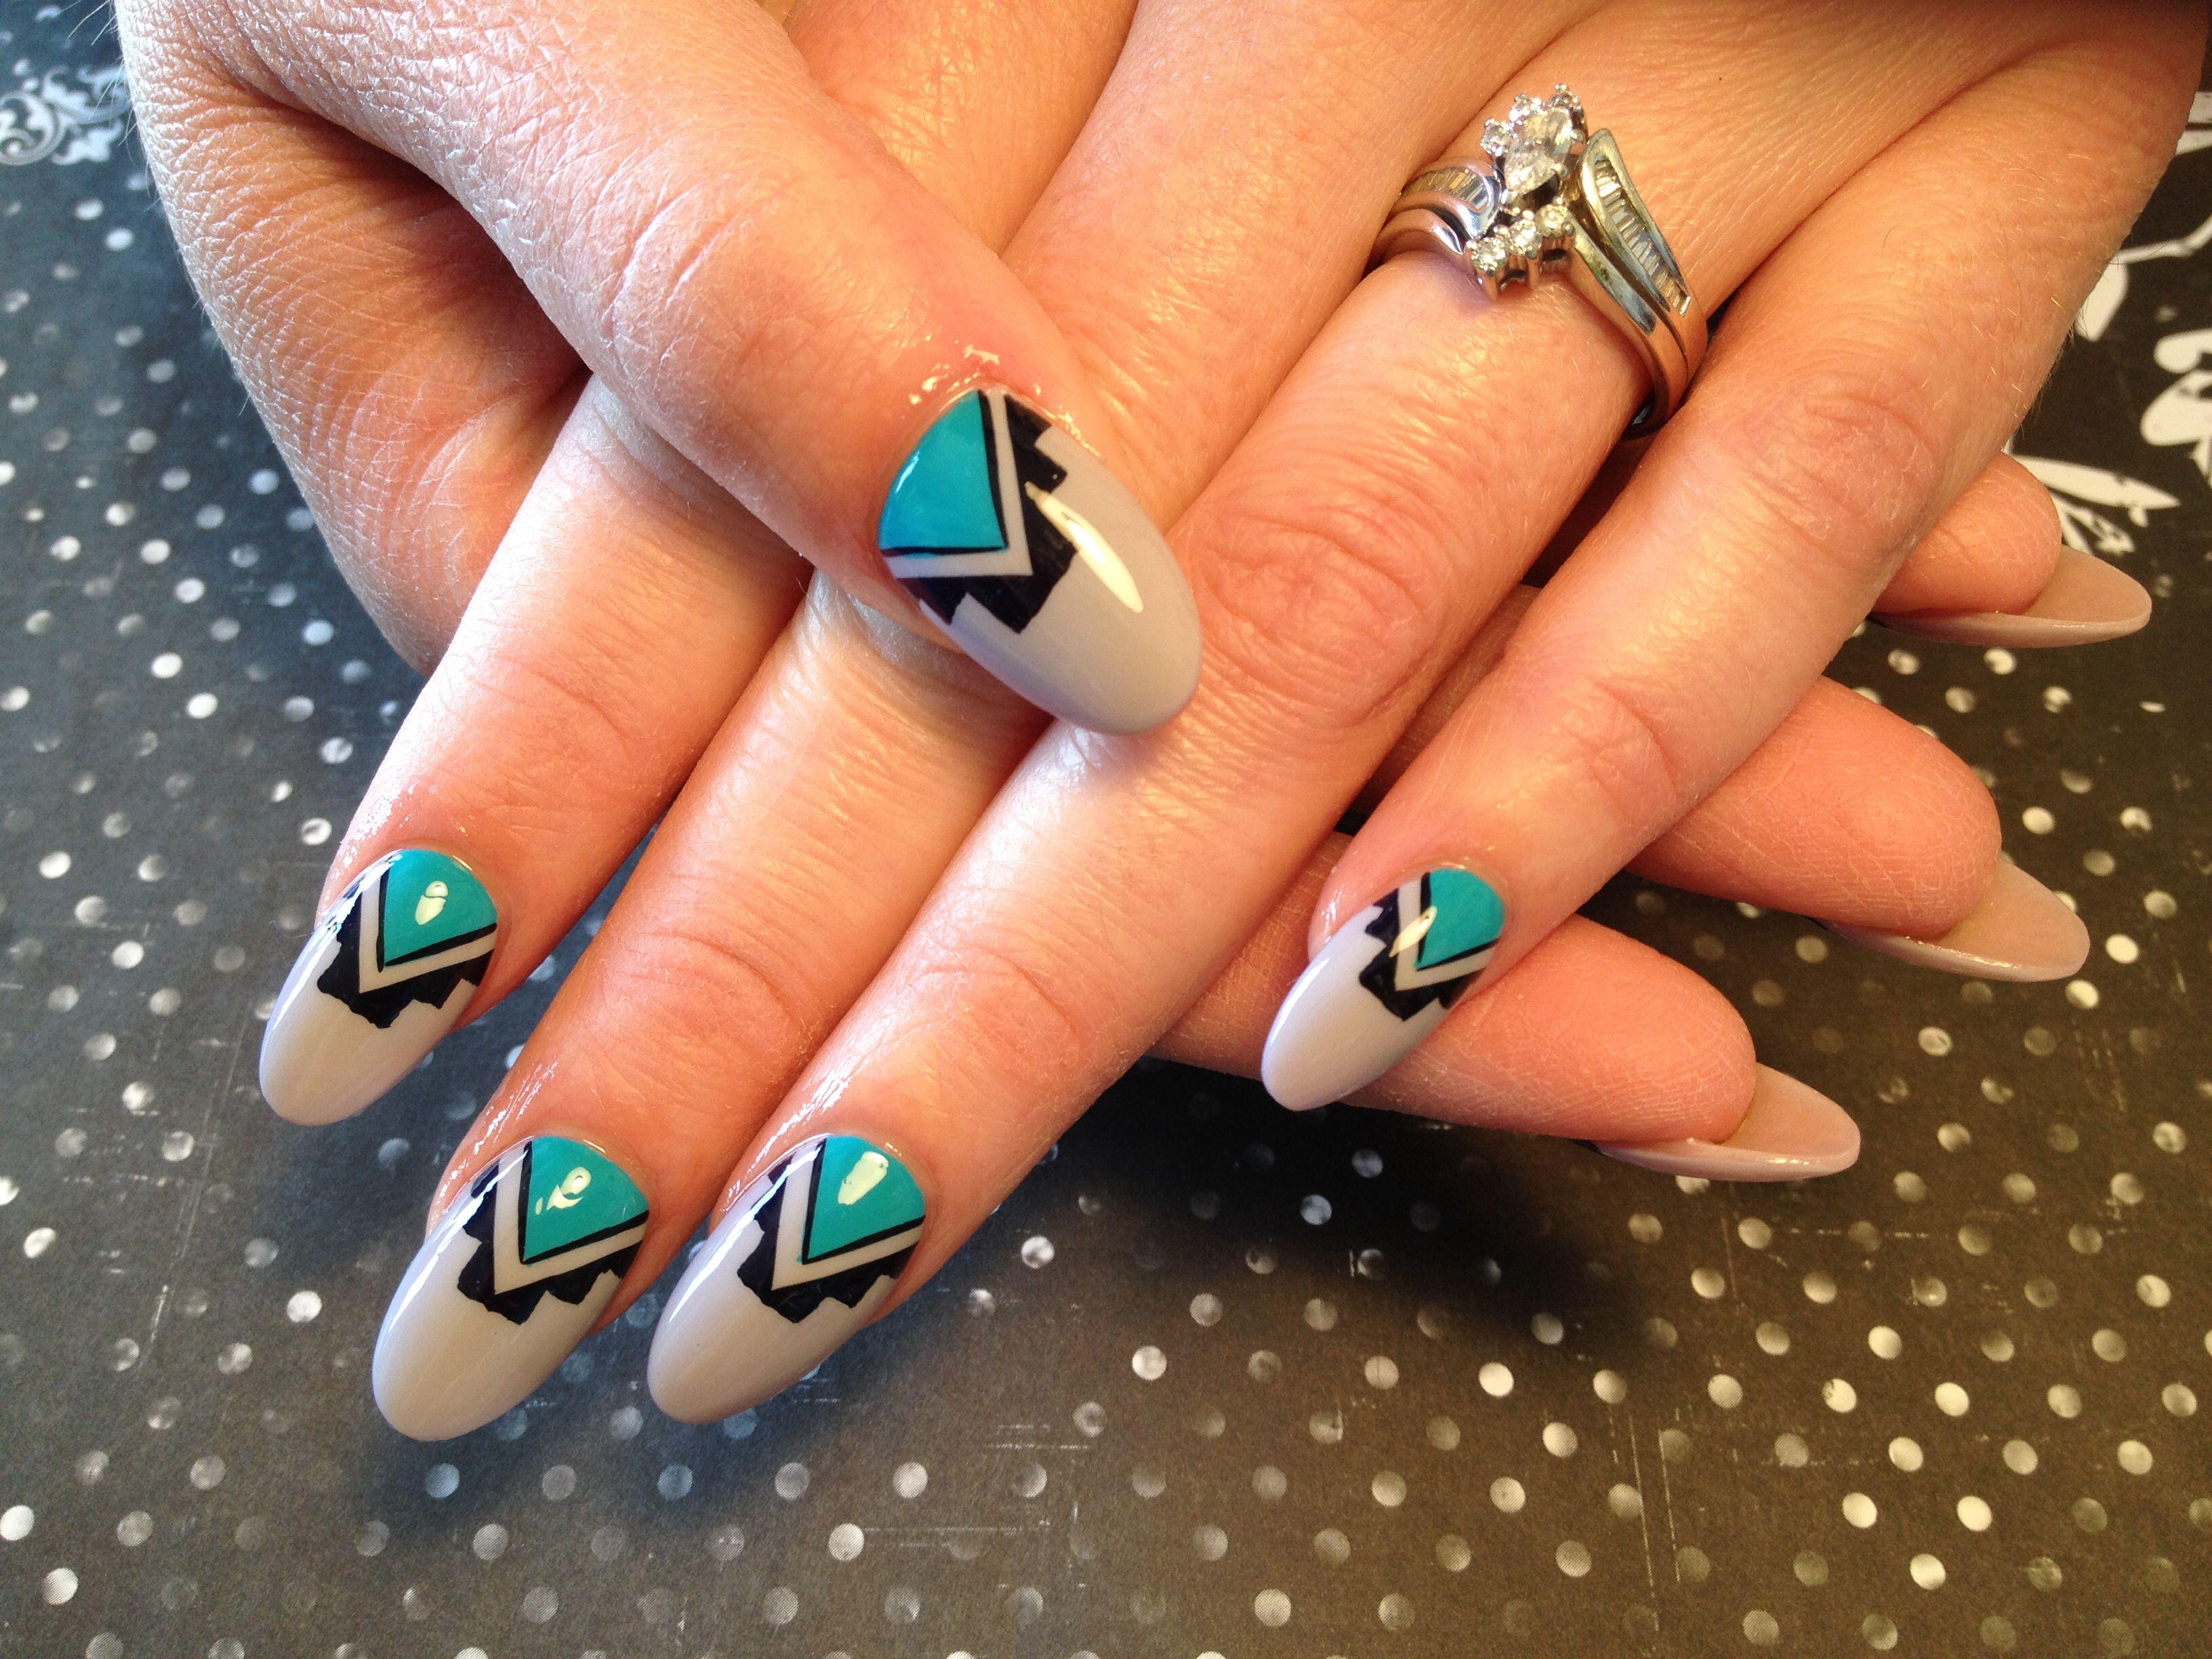 Native American nail art | Redneck Nailz nail art | Pinterest ...